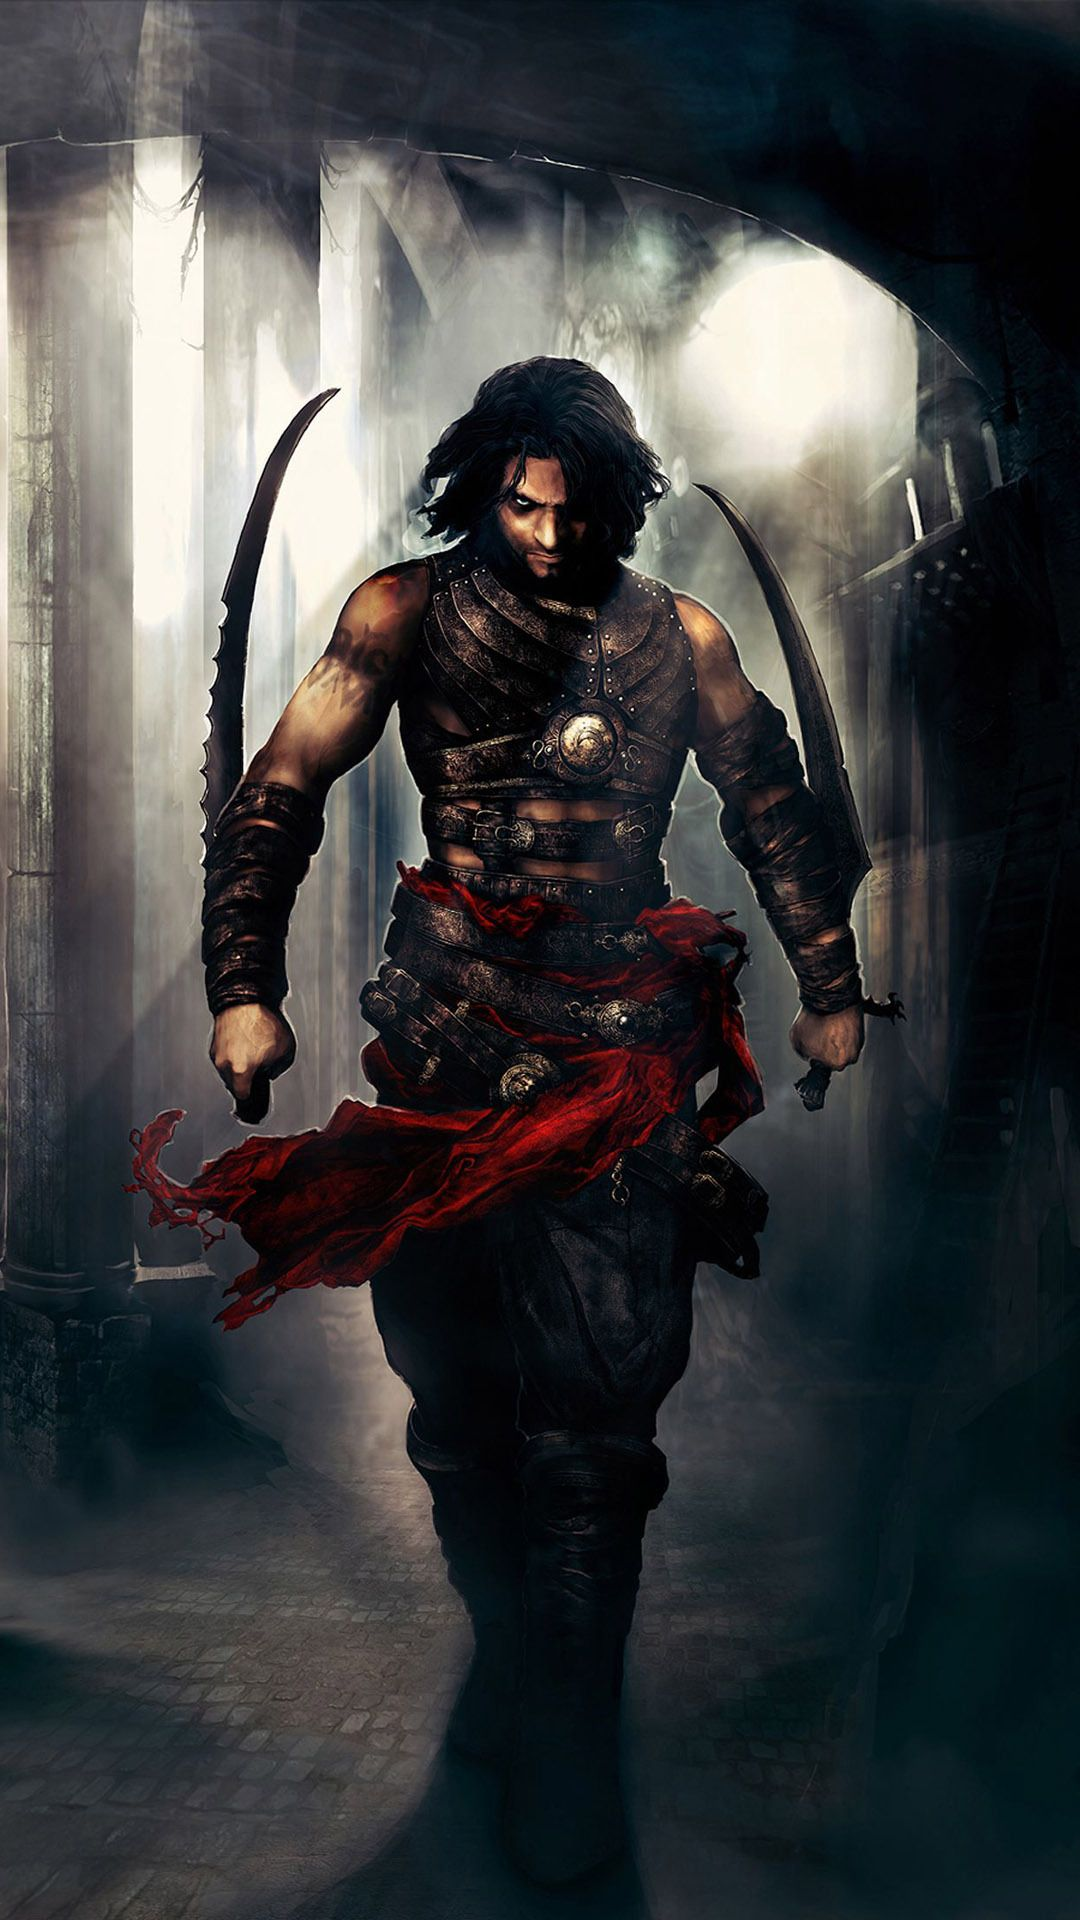 Fantastic Wallpaper Movie Prince Persia - 9f05b9ad2653a168b98ae2133b25bcd0  Pictures_1002025.jpg